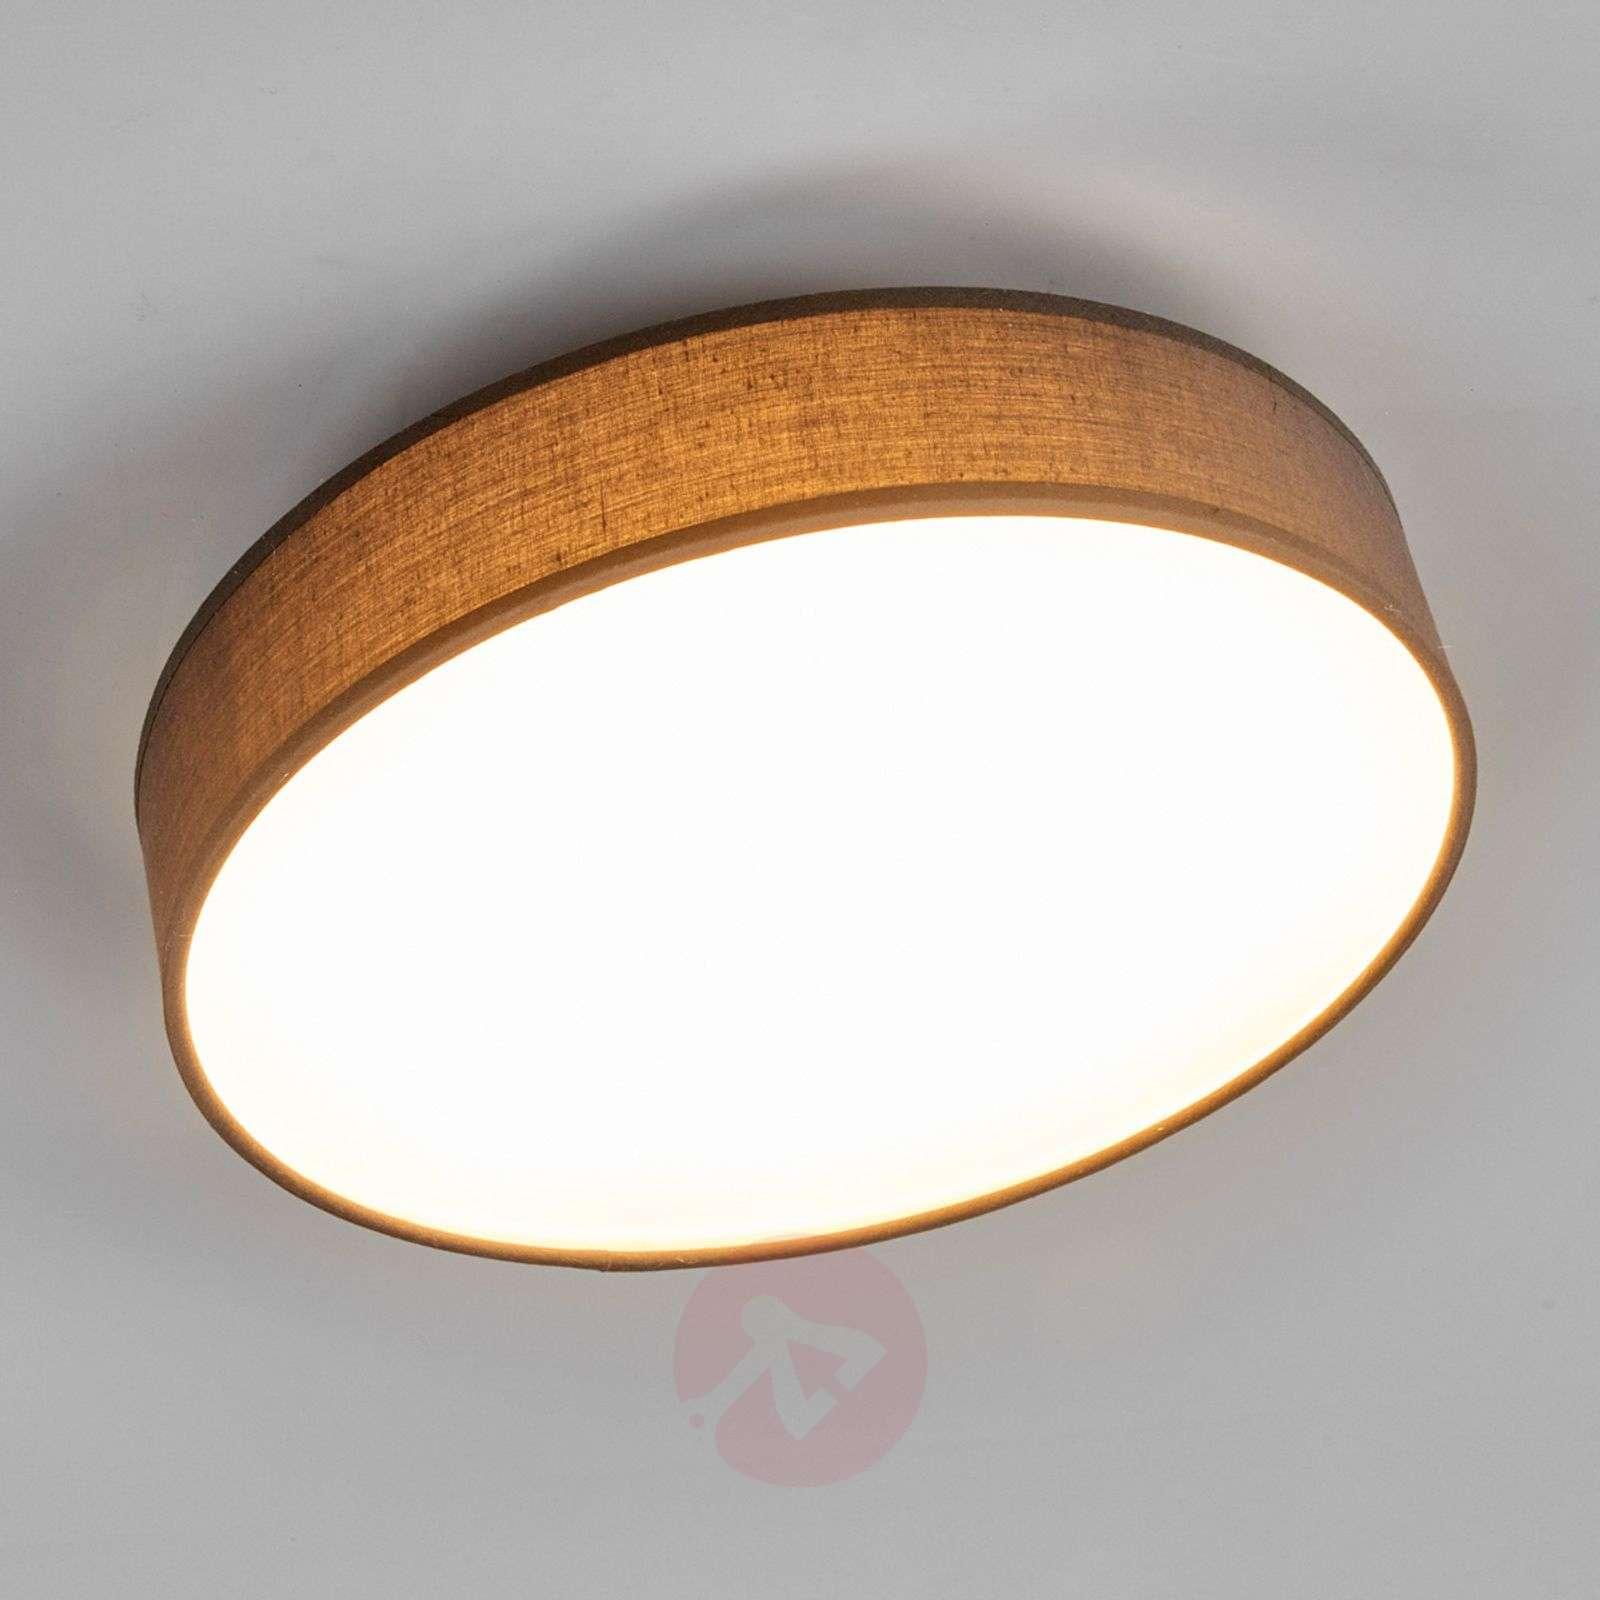 Grey fabric LED ceiling lamp Saira, 30 cm-9625088-02